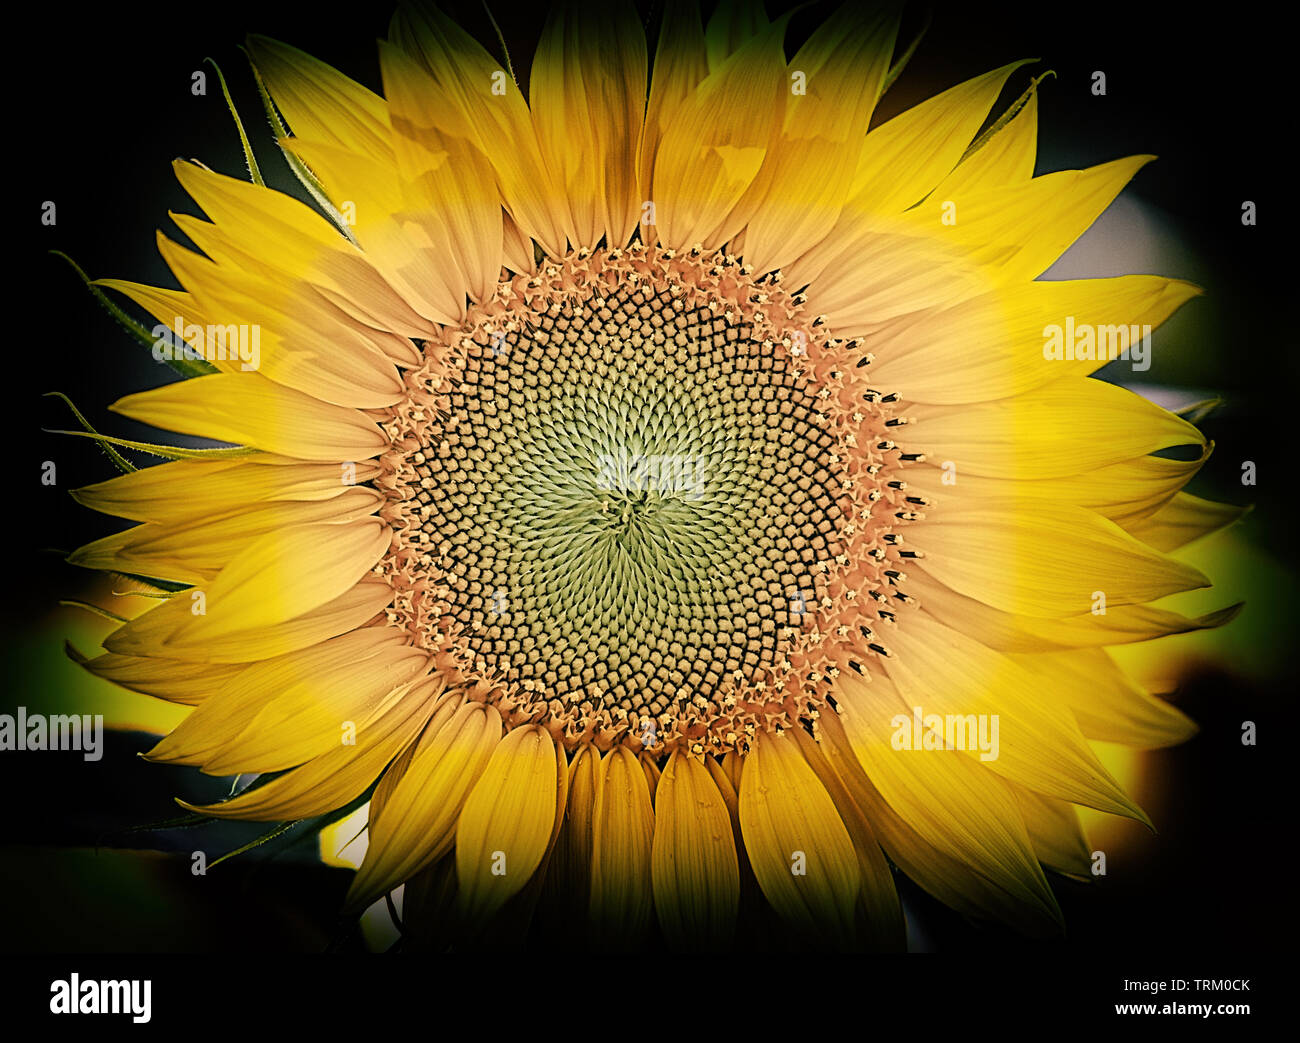 sunflower in the dark III Stock Photo